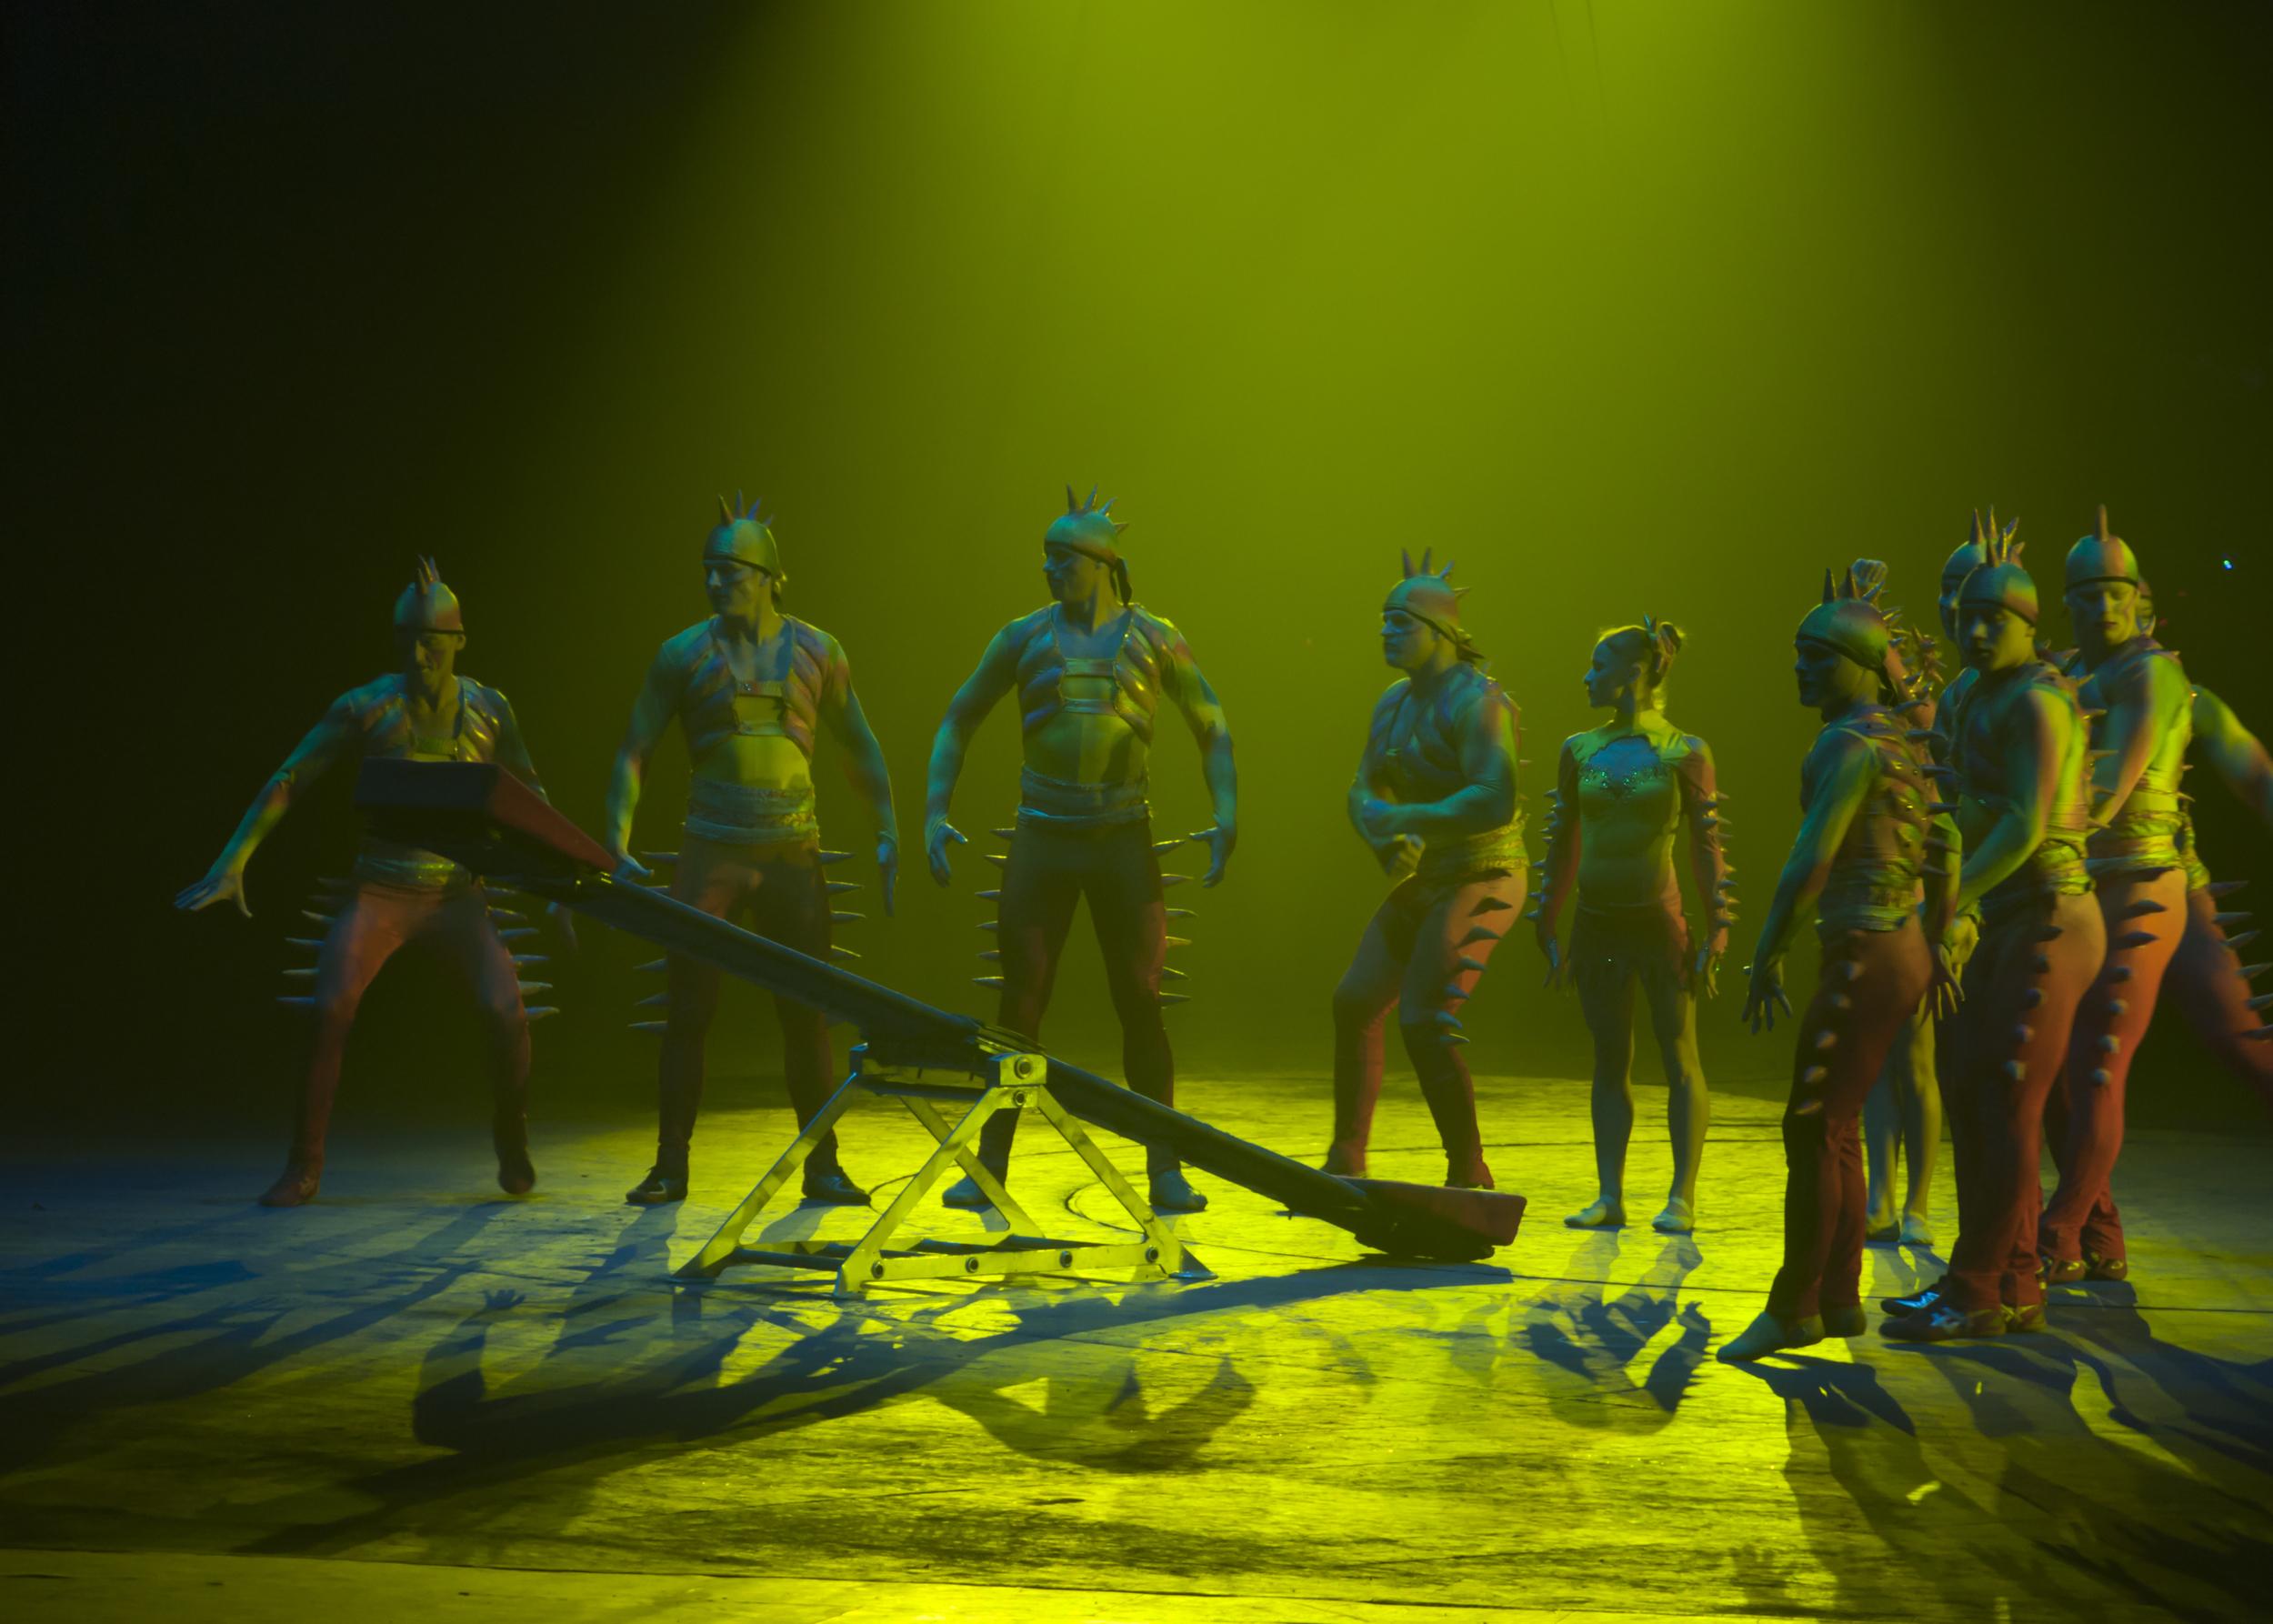 Acrobats at Chimelong International Circus, Guangzhou